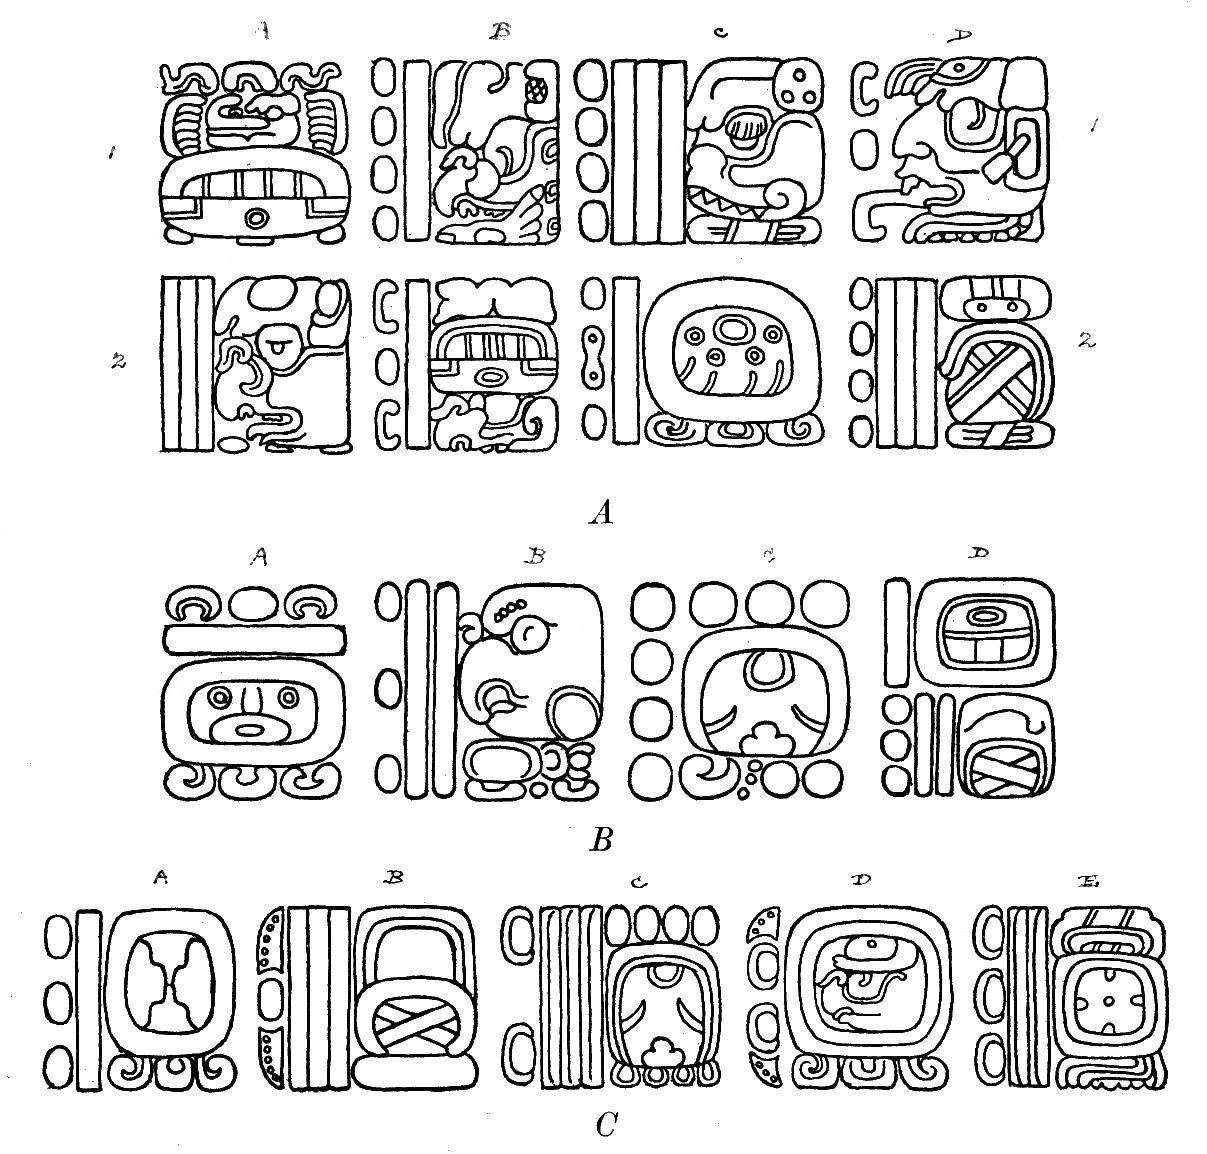 Mayan Hieroglyphics File:maya hieroglyphs fig 84.